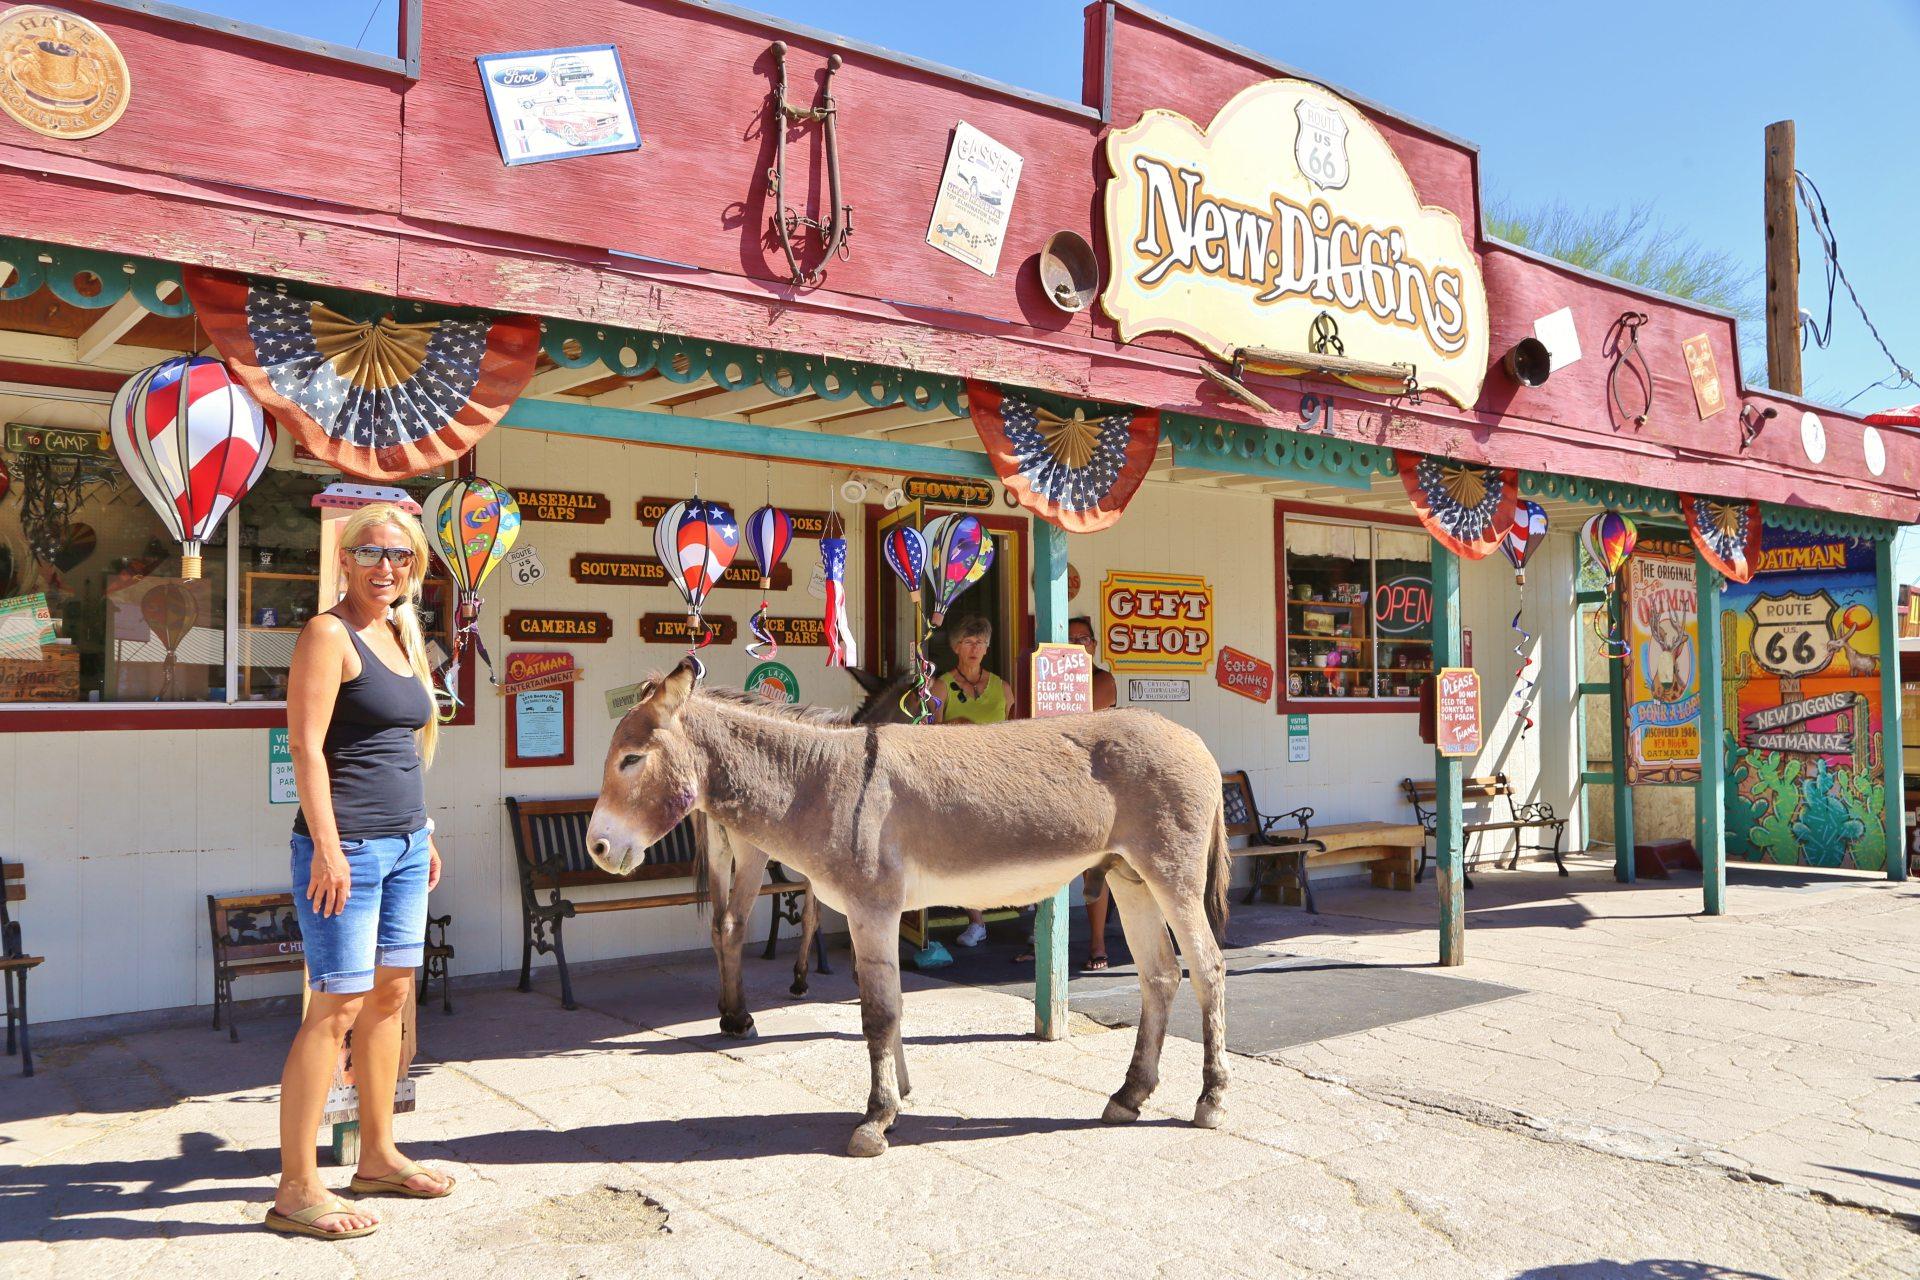 In Oatman sind die Esel los! - Arizona, Blondine, Burro, Esel, Gebäude, Ghost town, Gift Shop, New Diggins, Oatman, Oatman Ghost Town, Personen, Portrait, Porträt, Route 66, Souvenierladen - HOFBAUER-HOFMANN Sofia - (Oatman, Arizona, Vereinigte Staaten)